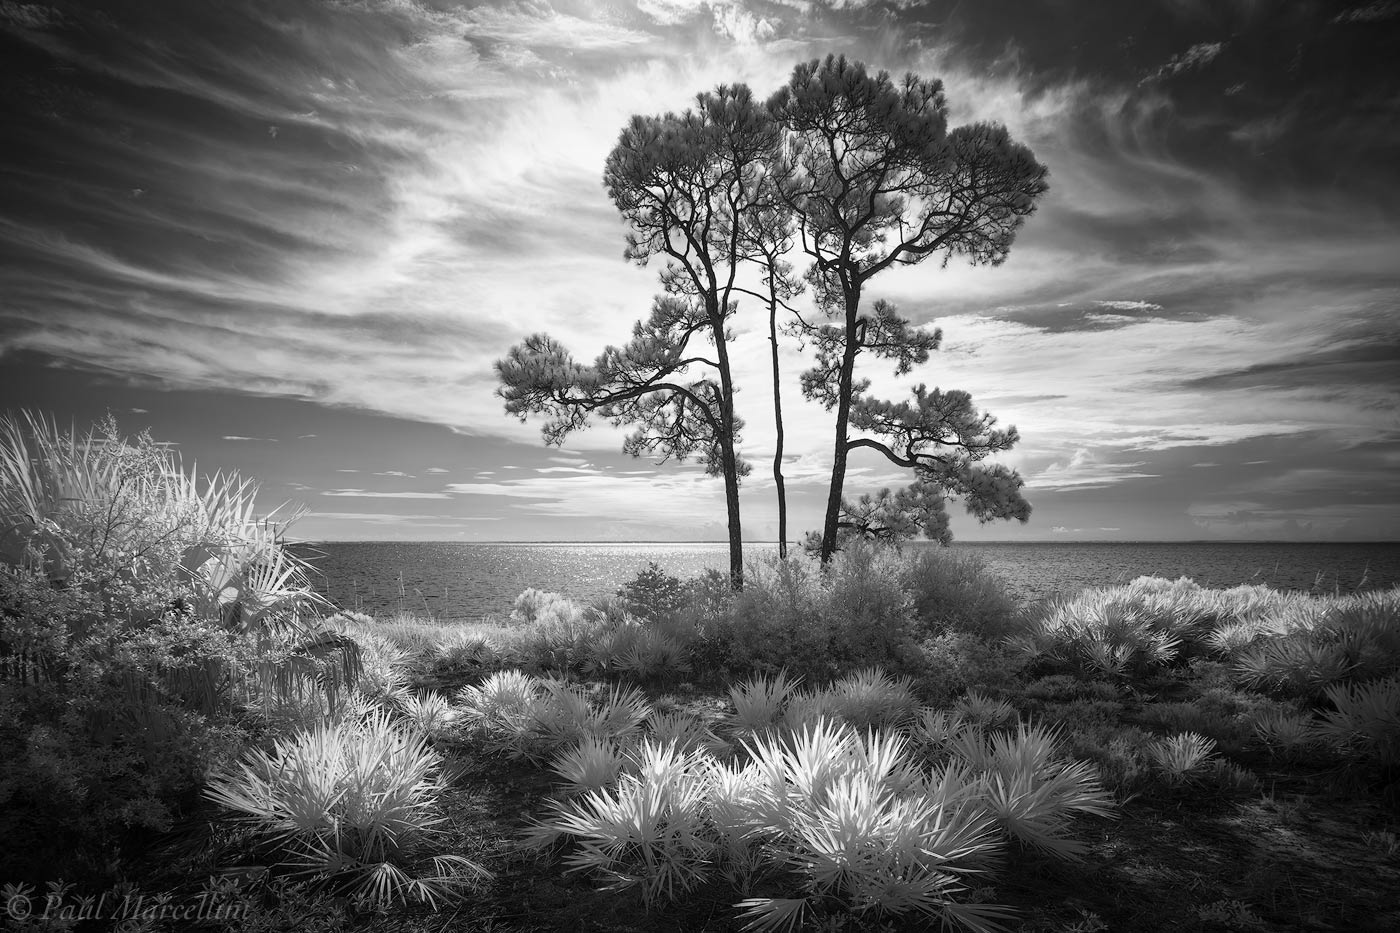 Cape San Blas, St. Joseph Peninsula State Park, Florida, photo